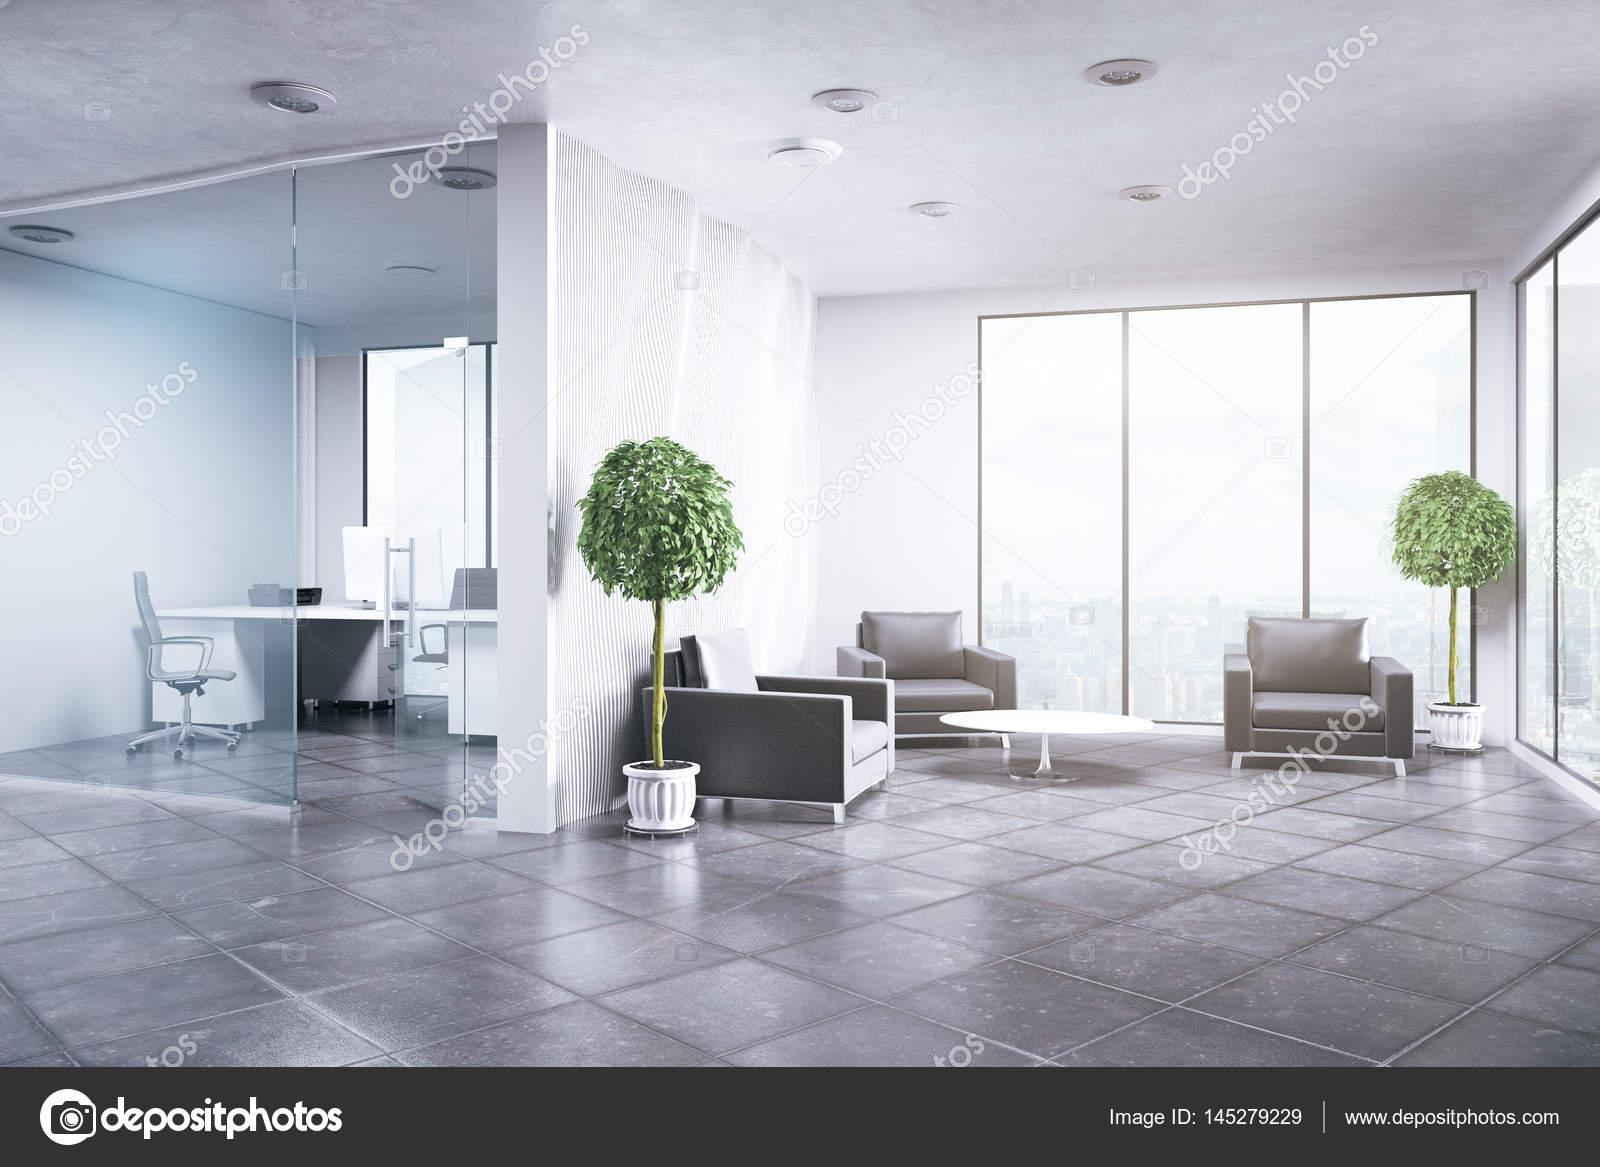 Im genes del interior de una oficina interior oficina for Foto interior design